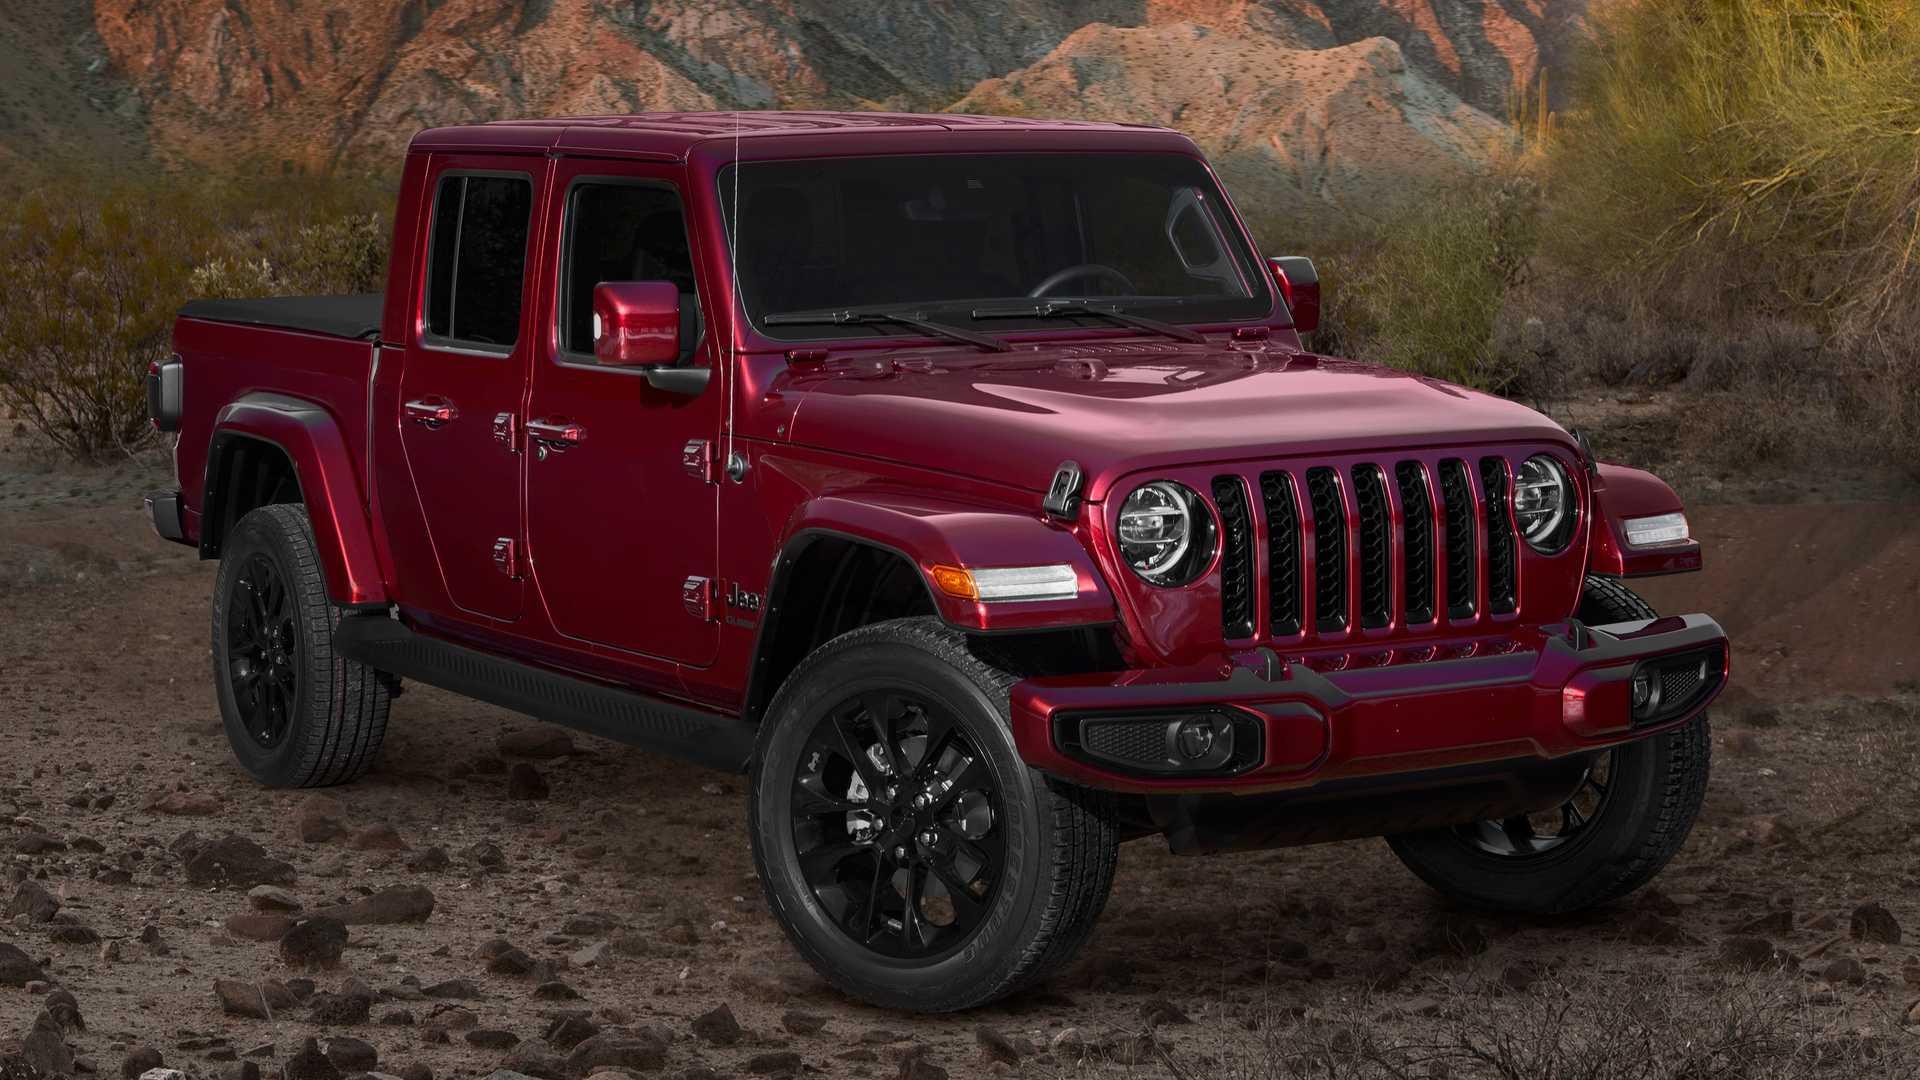 2020-jeep-gladiator-high-altitude-1